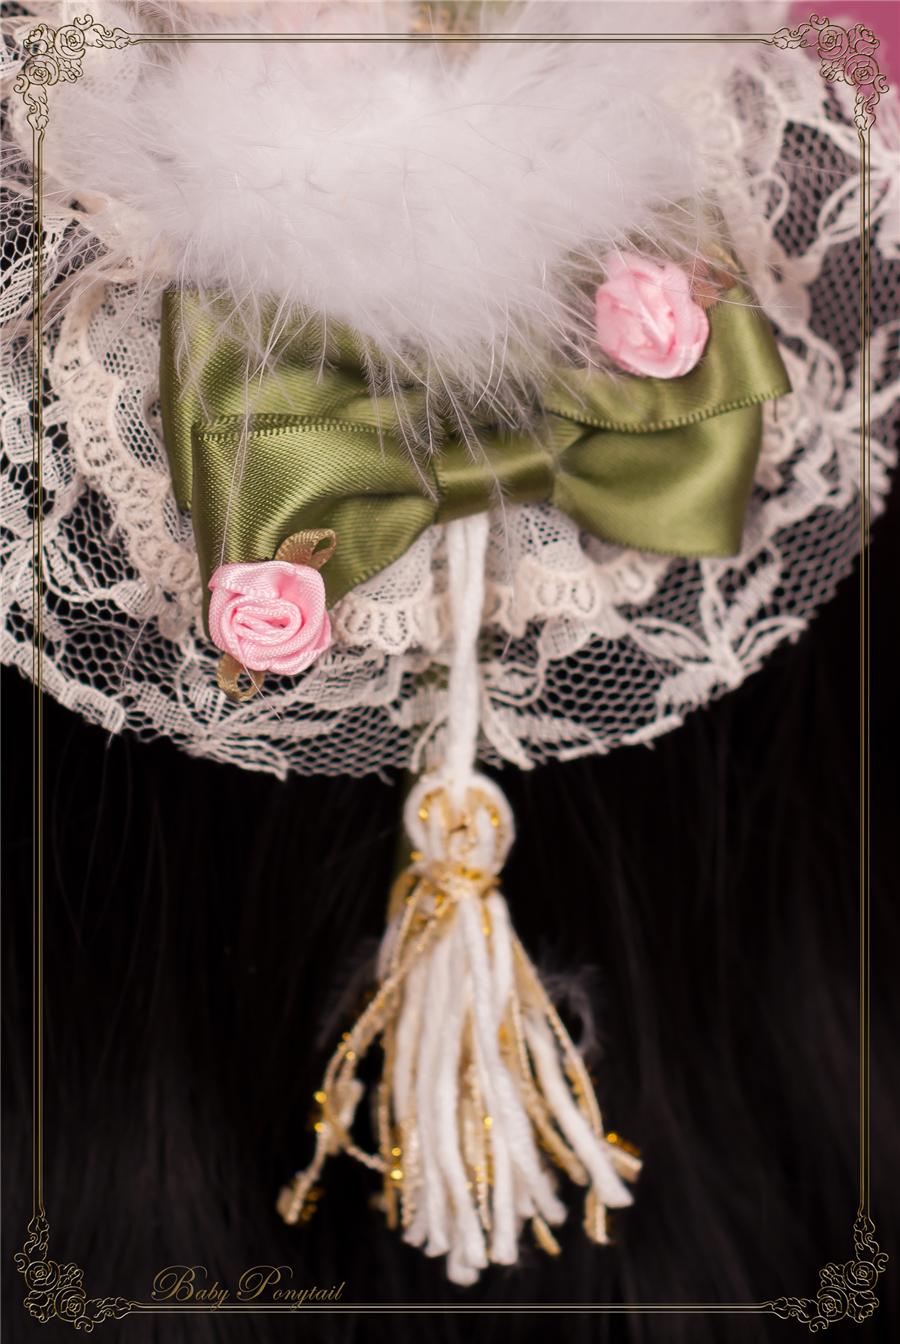 Babyponytail_Accessory_Tassel Head Dress_Green_04.jpg